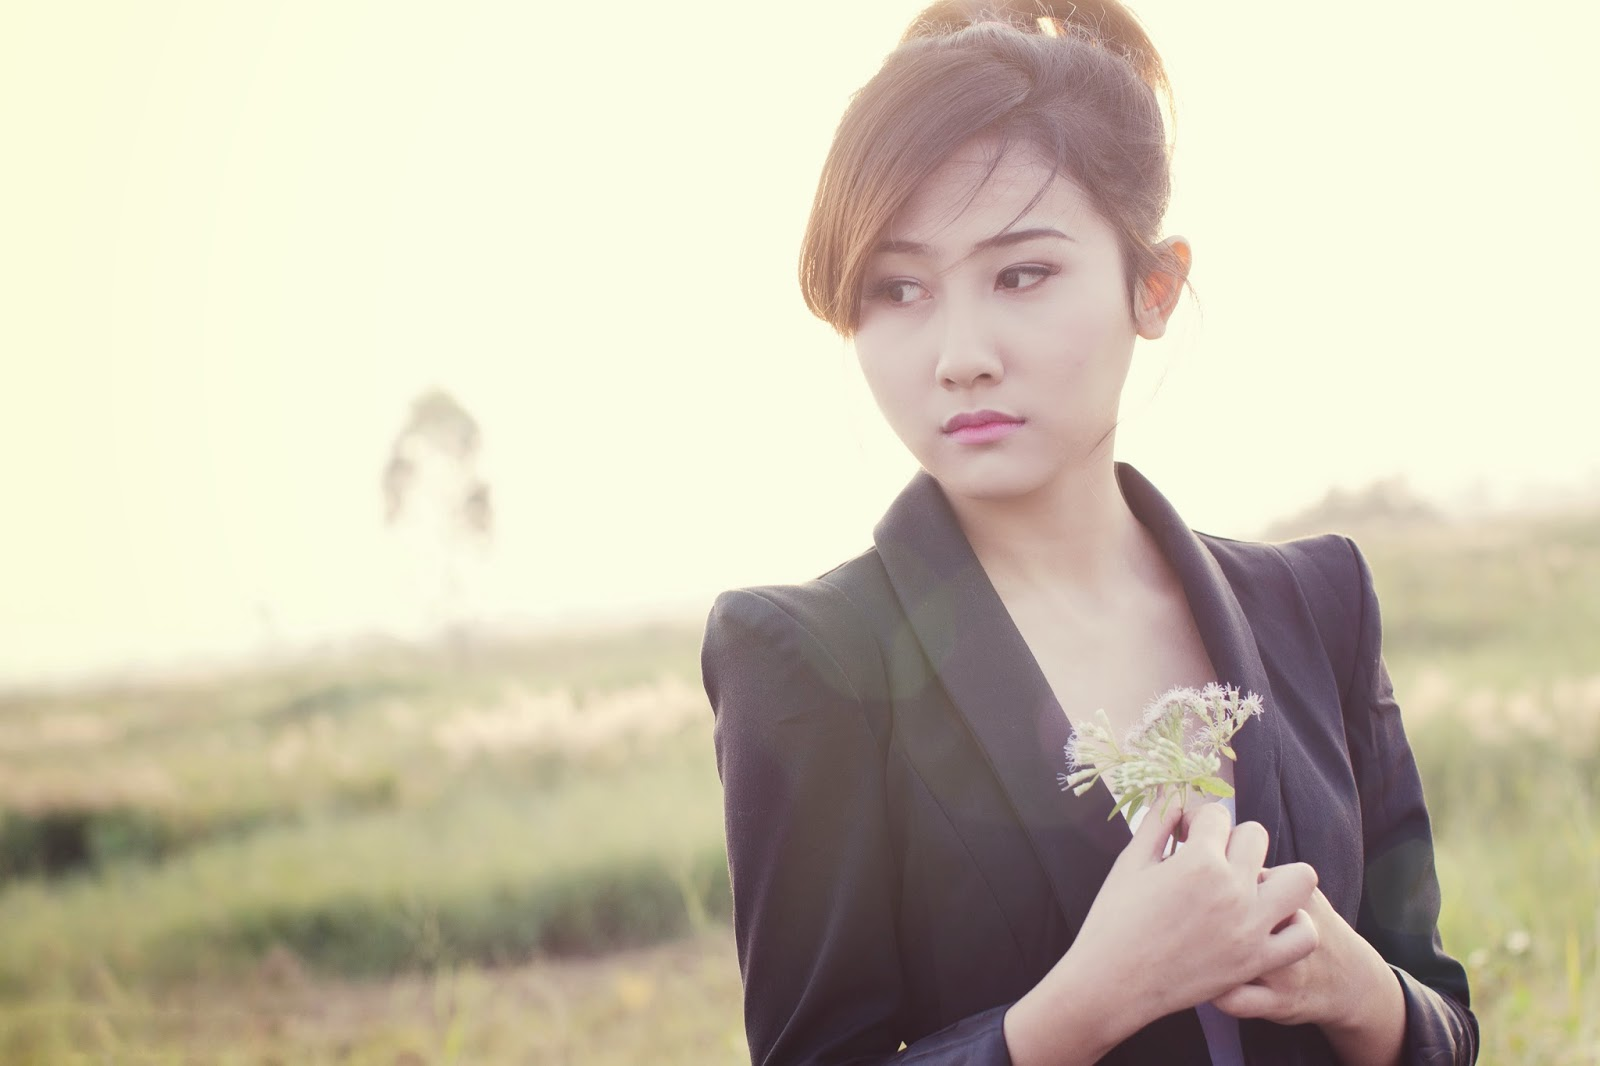 Download Cute Baby Wallpapers Free Beautiful Vietnamese Girls Wallpapers Most Beautiful